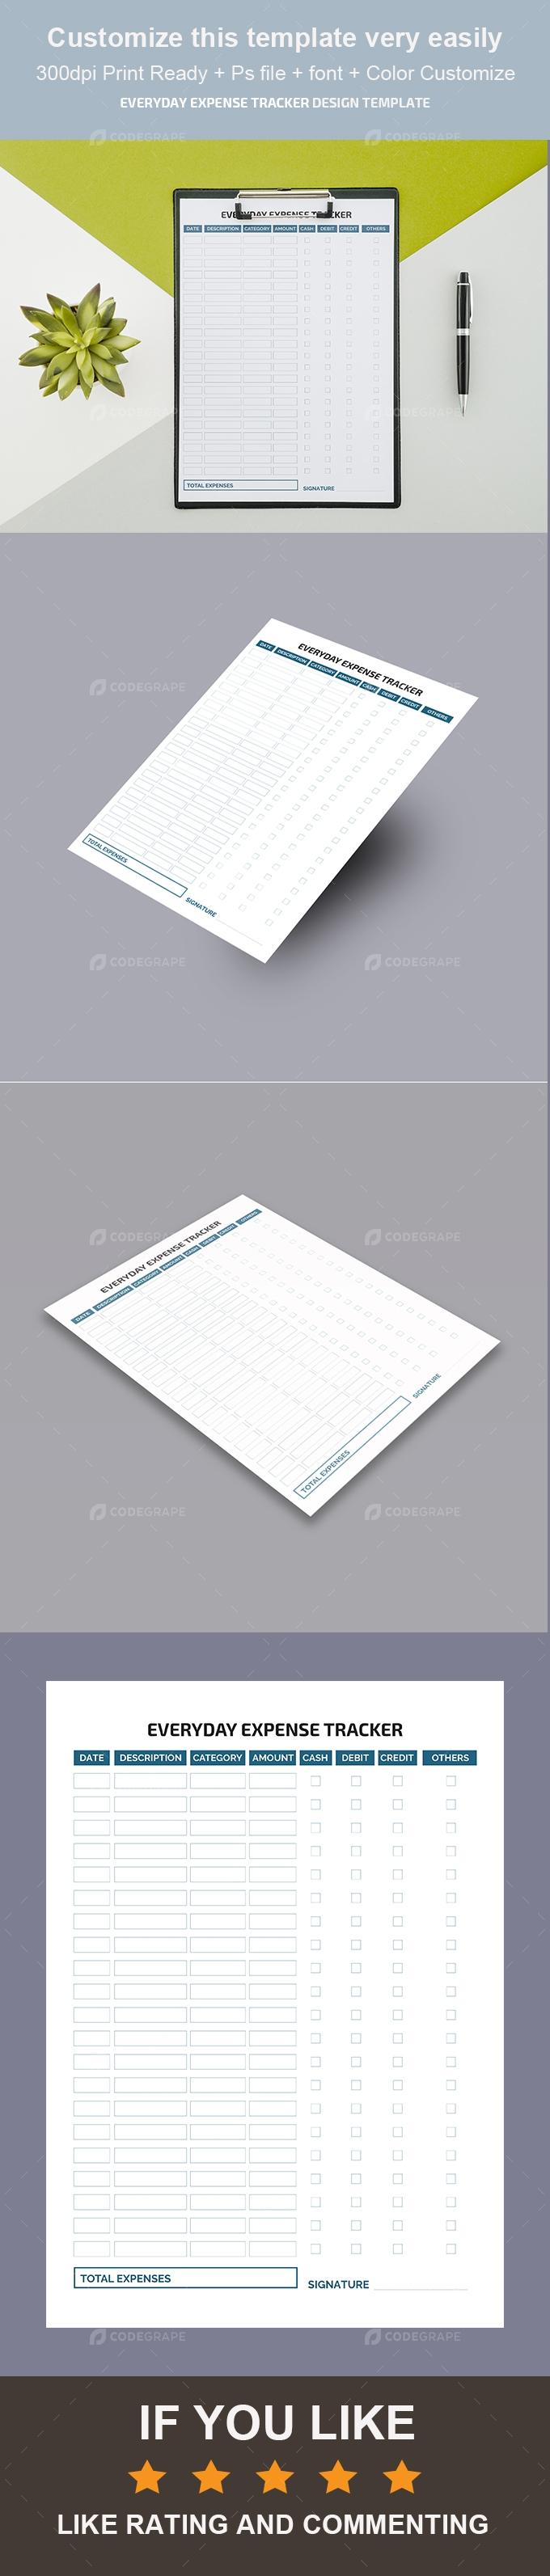 Corporate Everyday Expense Tracker